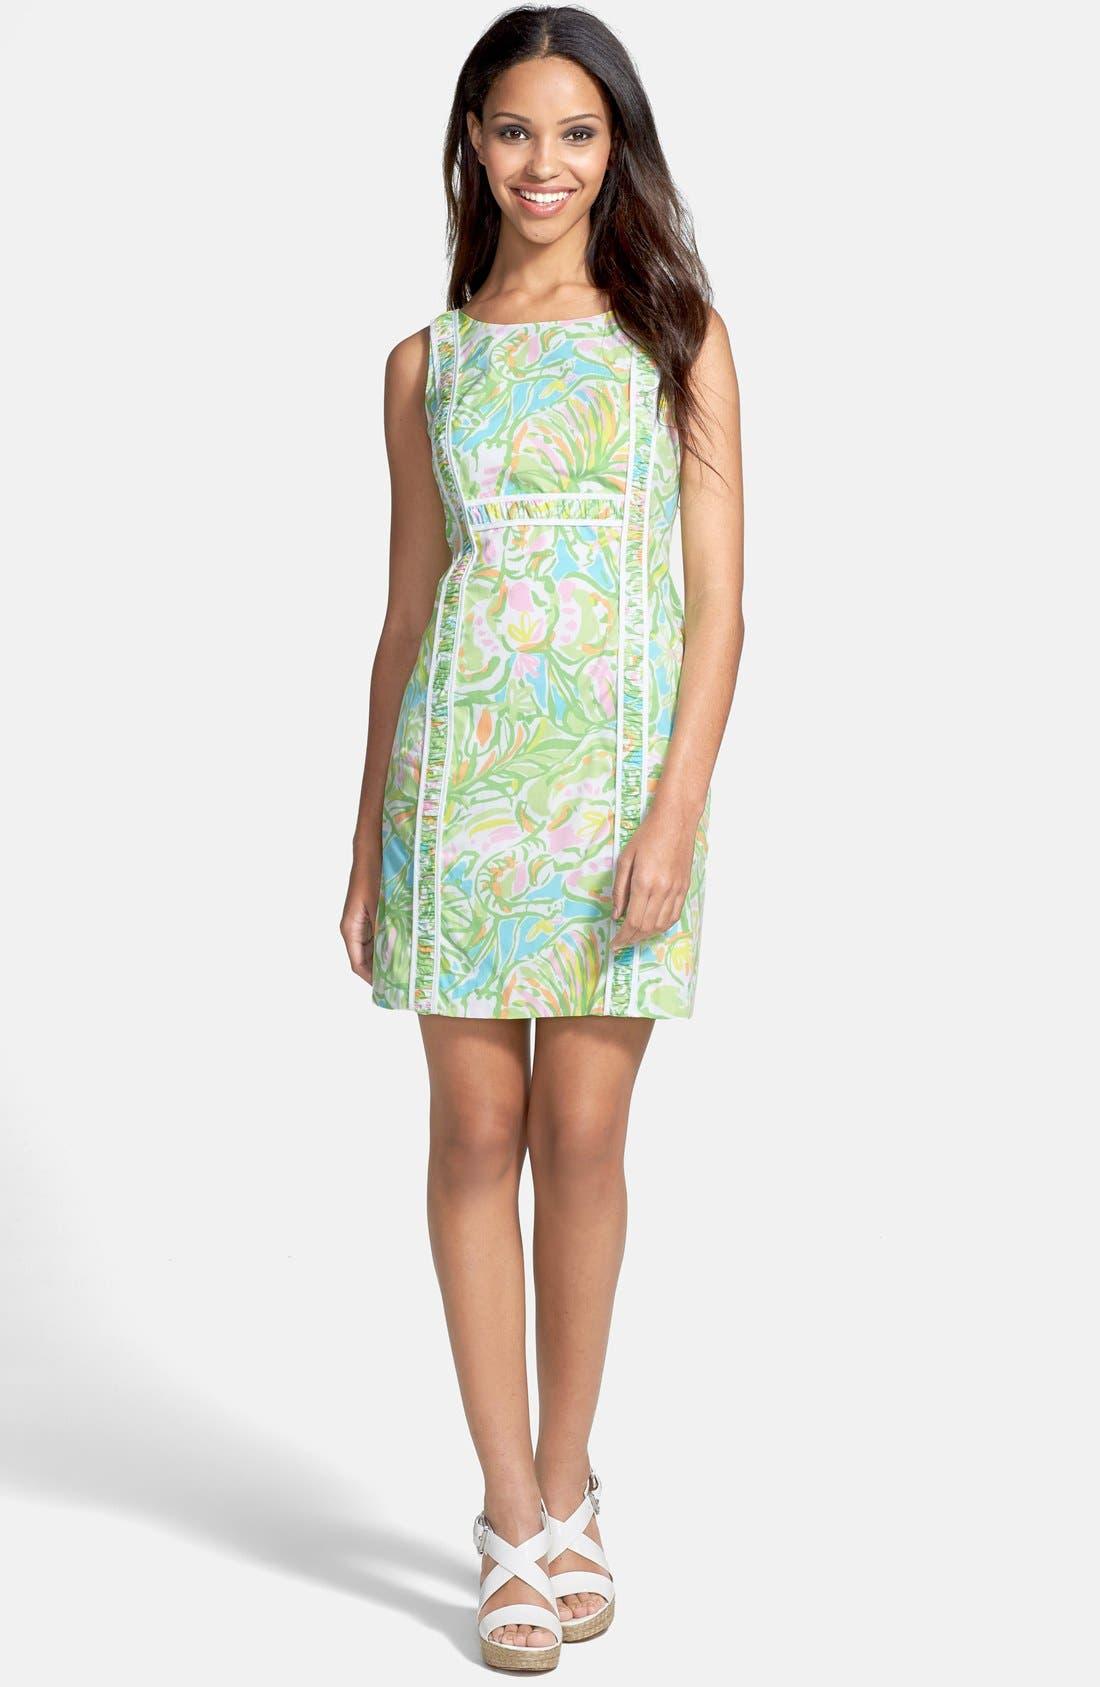 Main Image - Lilly Pulitzer® 'Fryer' Print Cotton Poplin Shift Dress